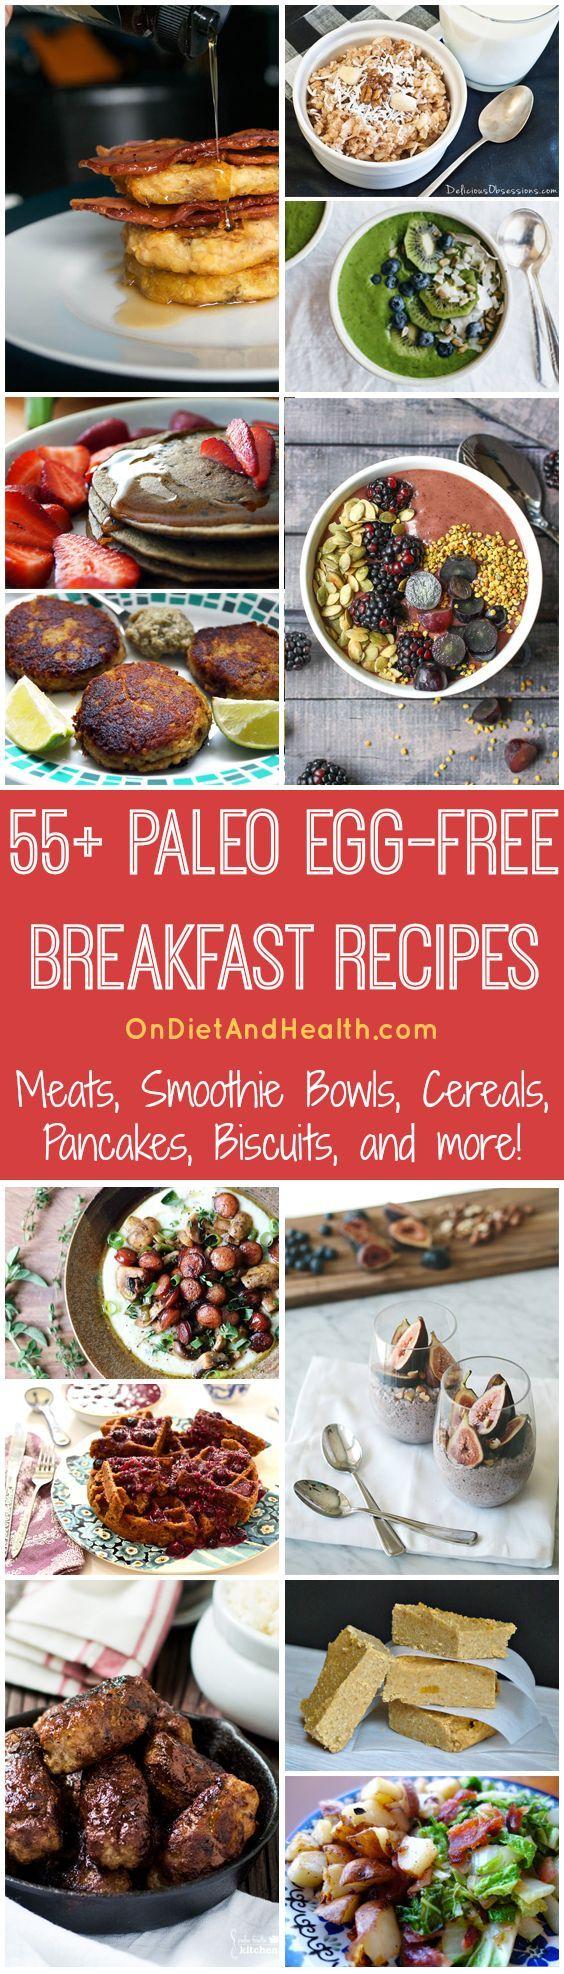 55 Paleo Egg-Free Breakfast Recipes Pinterest